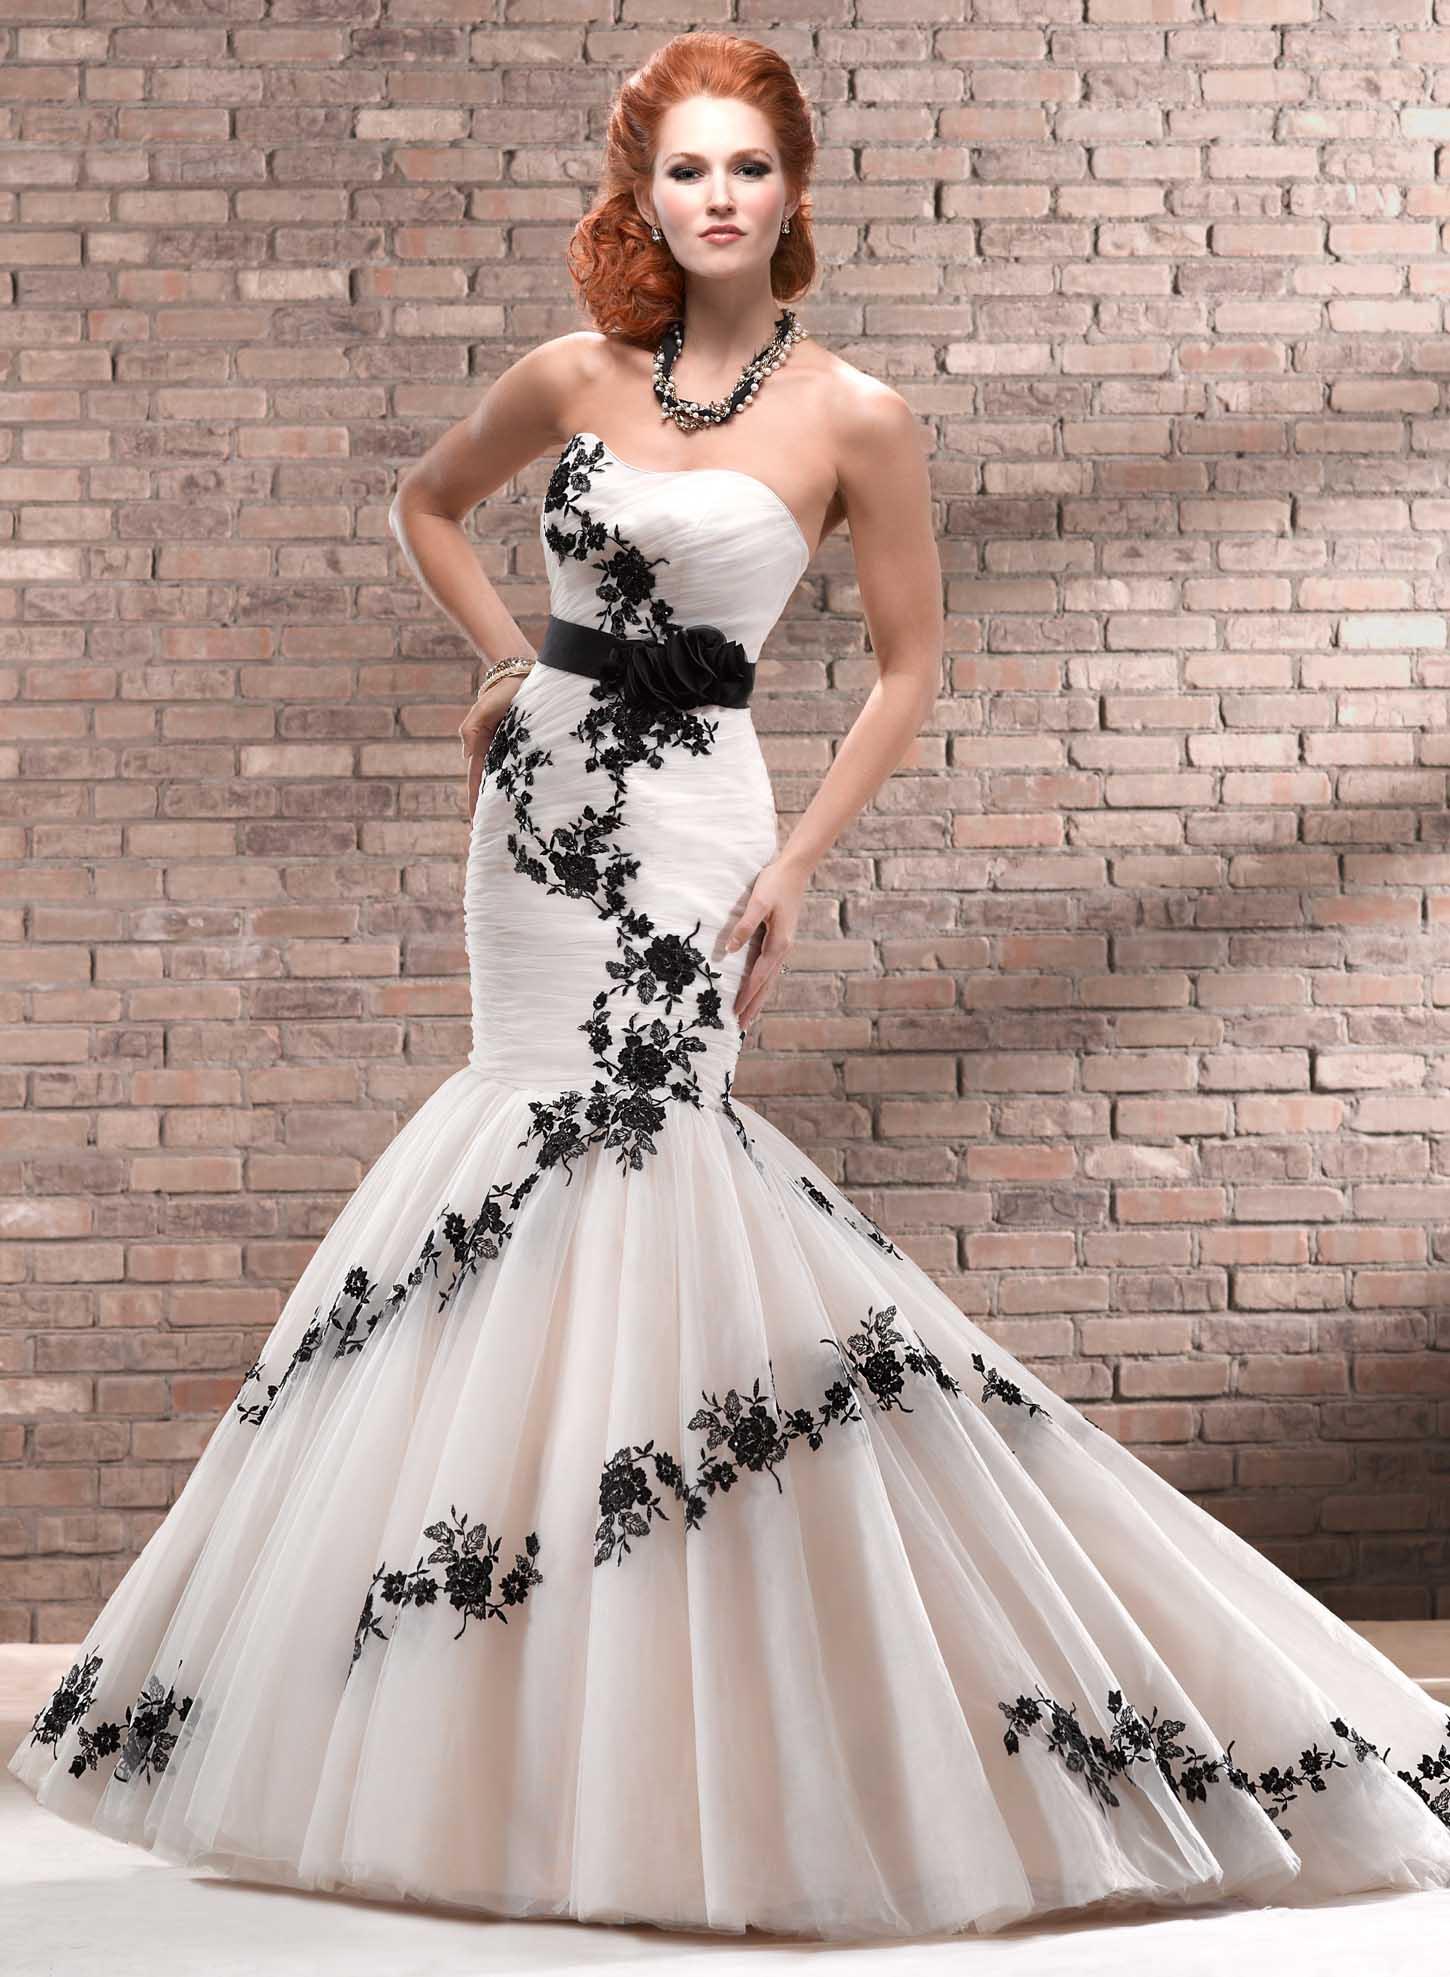 black wedding dresses black wedding dresses Black and White Wedding Dresses